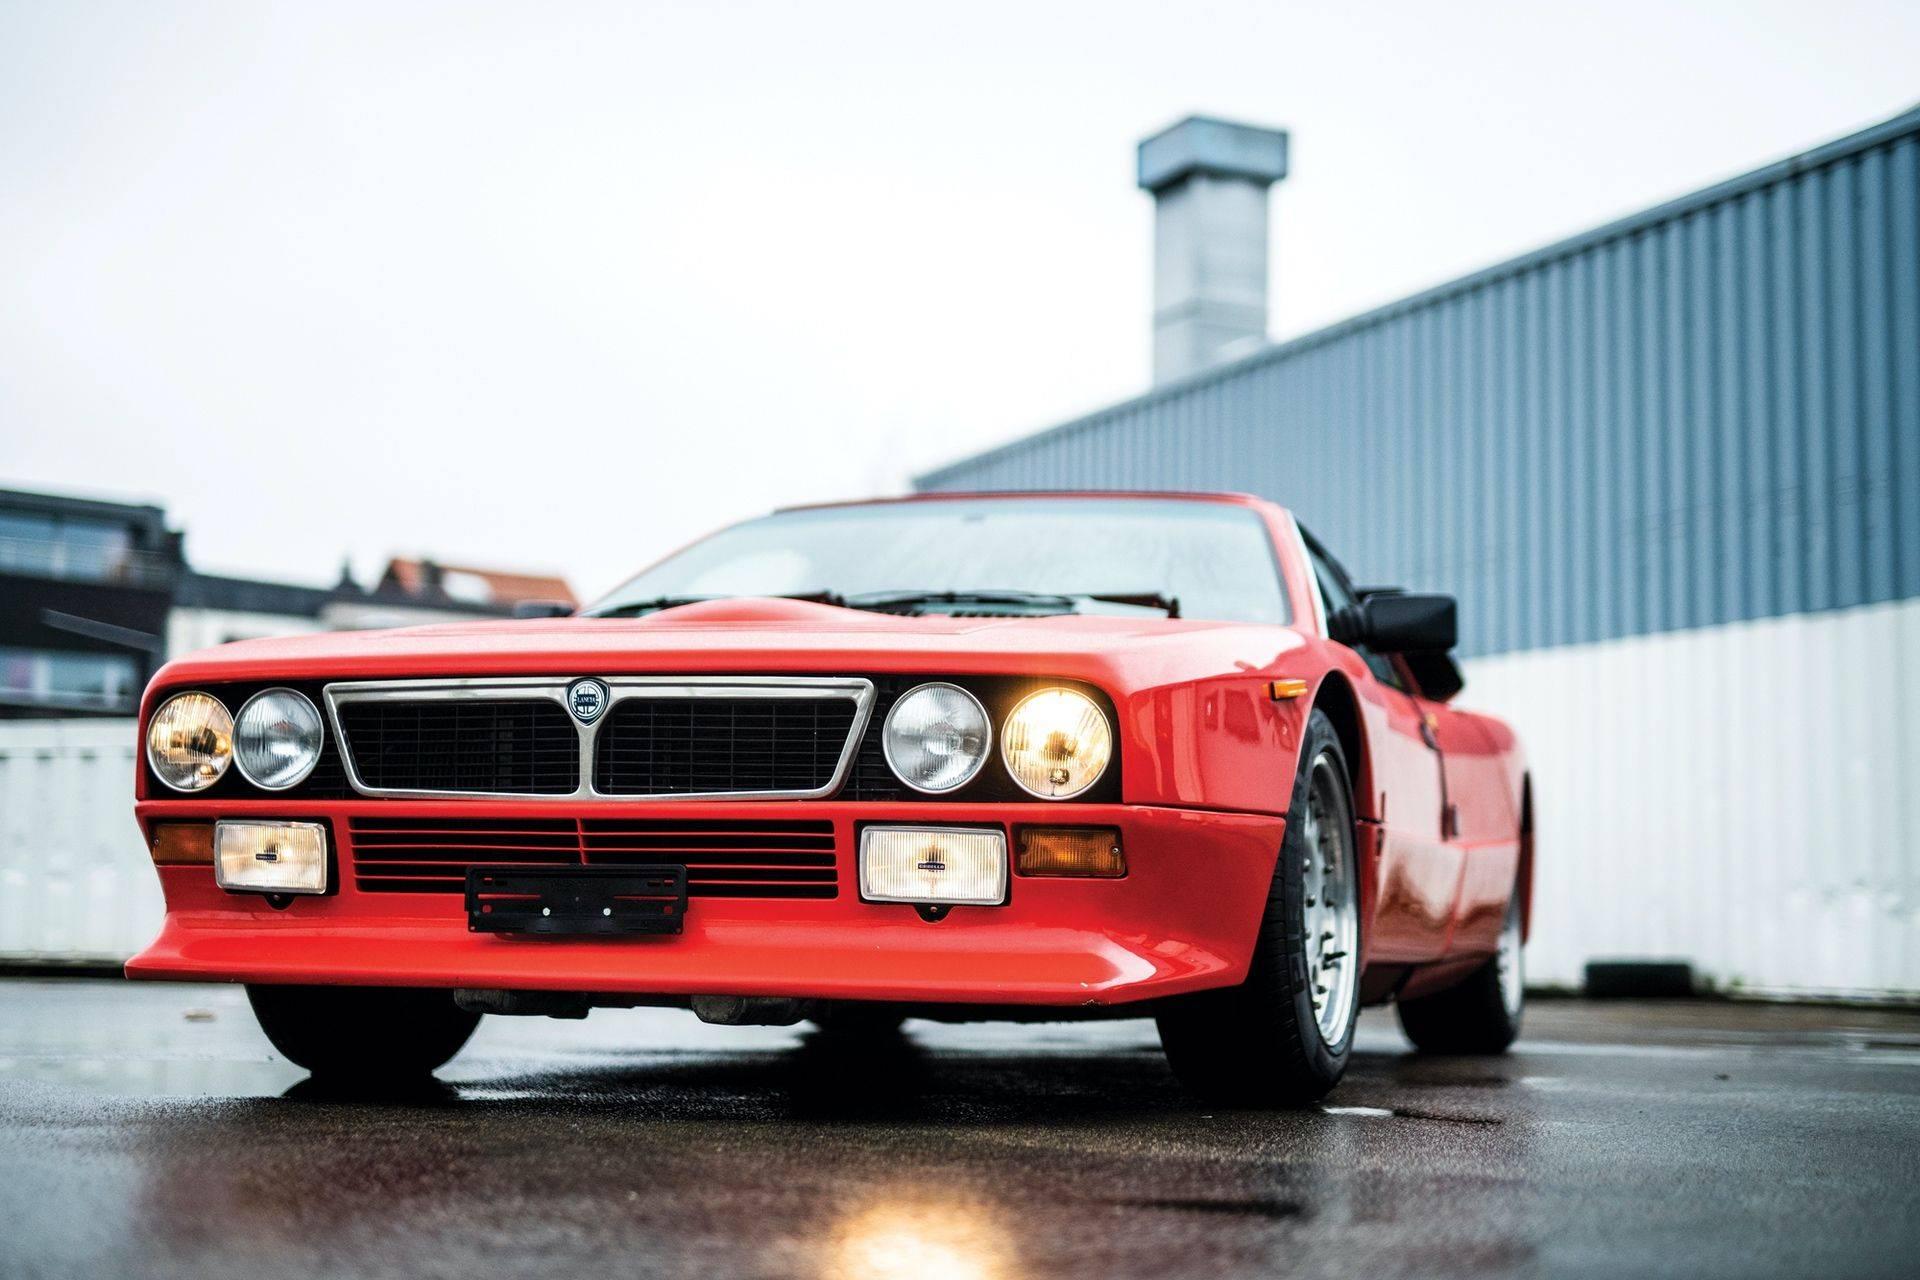 1981_Lancia_037_Stradale_sale_0005